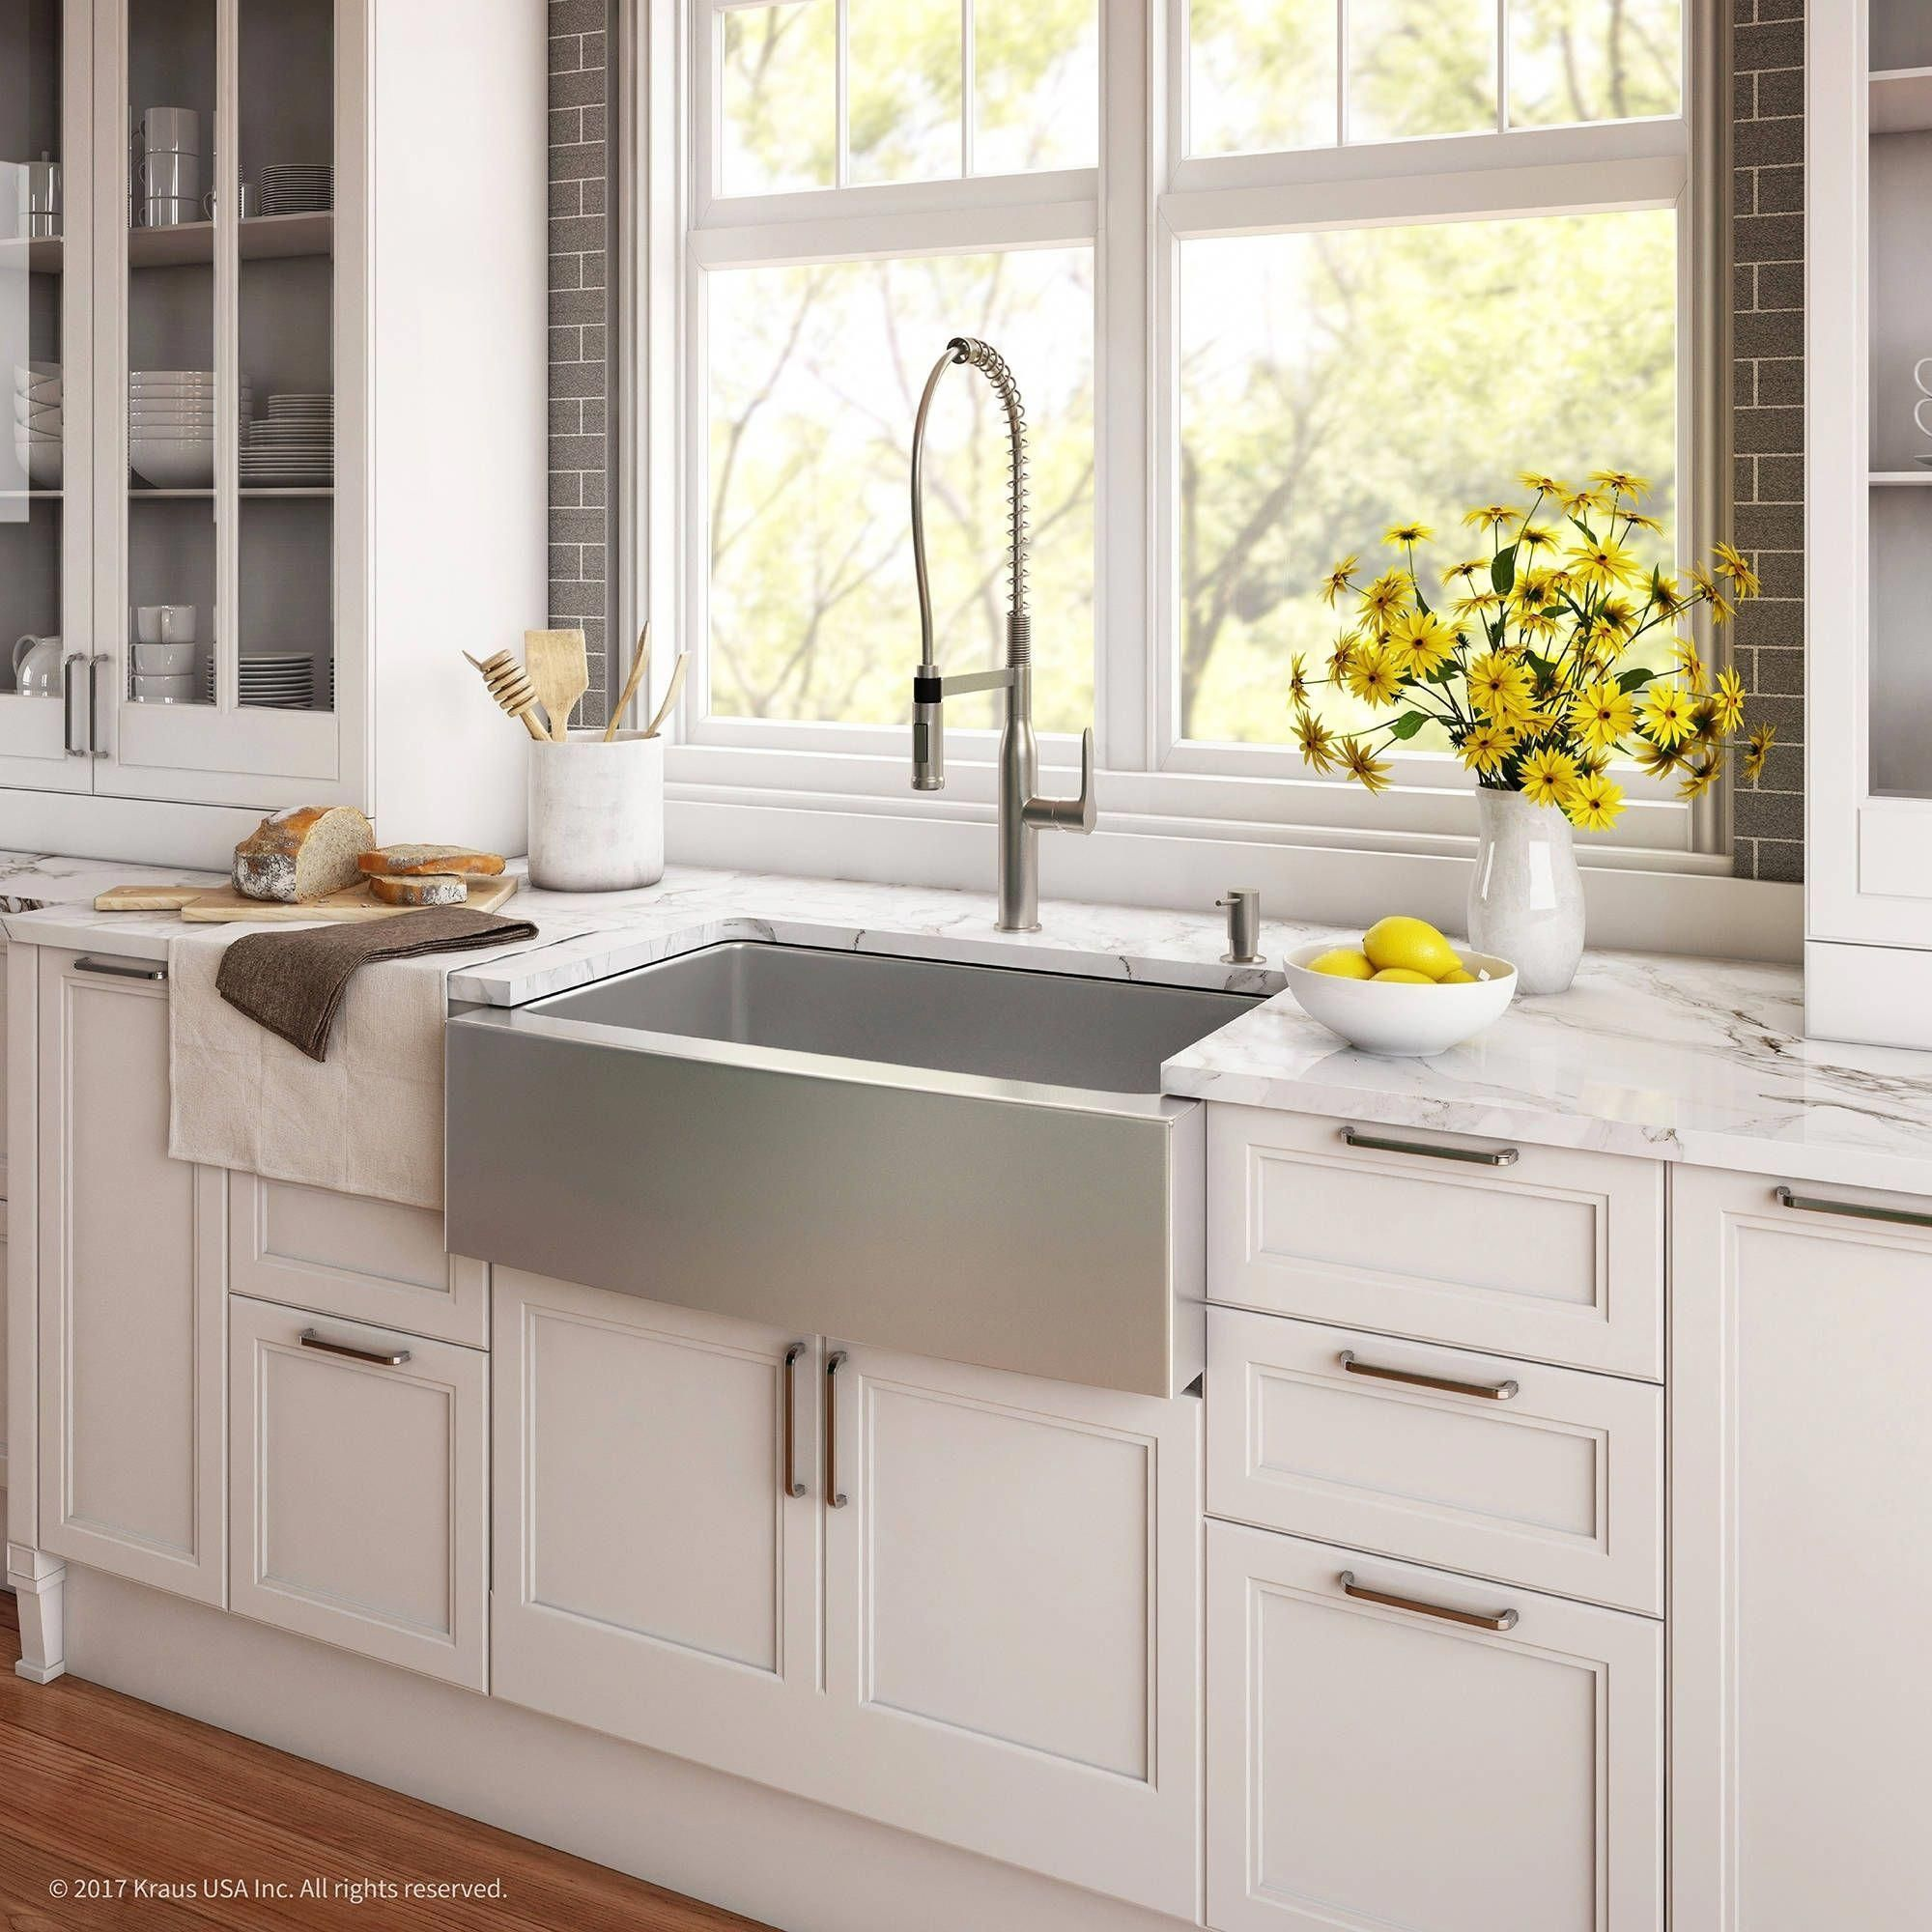 Kraus 30 Inch Farmhouse Single Bowl Stainless Steel Kitchen Sink